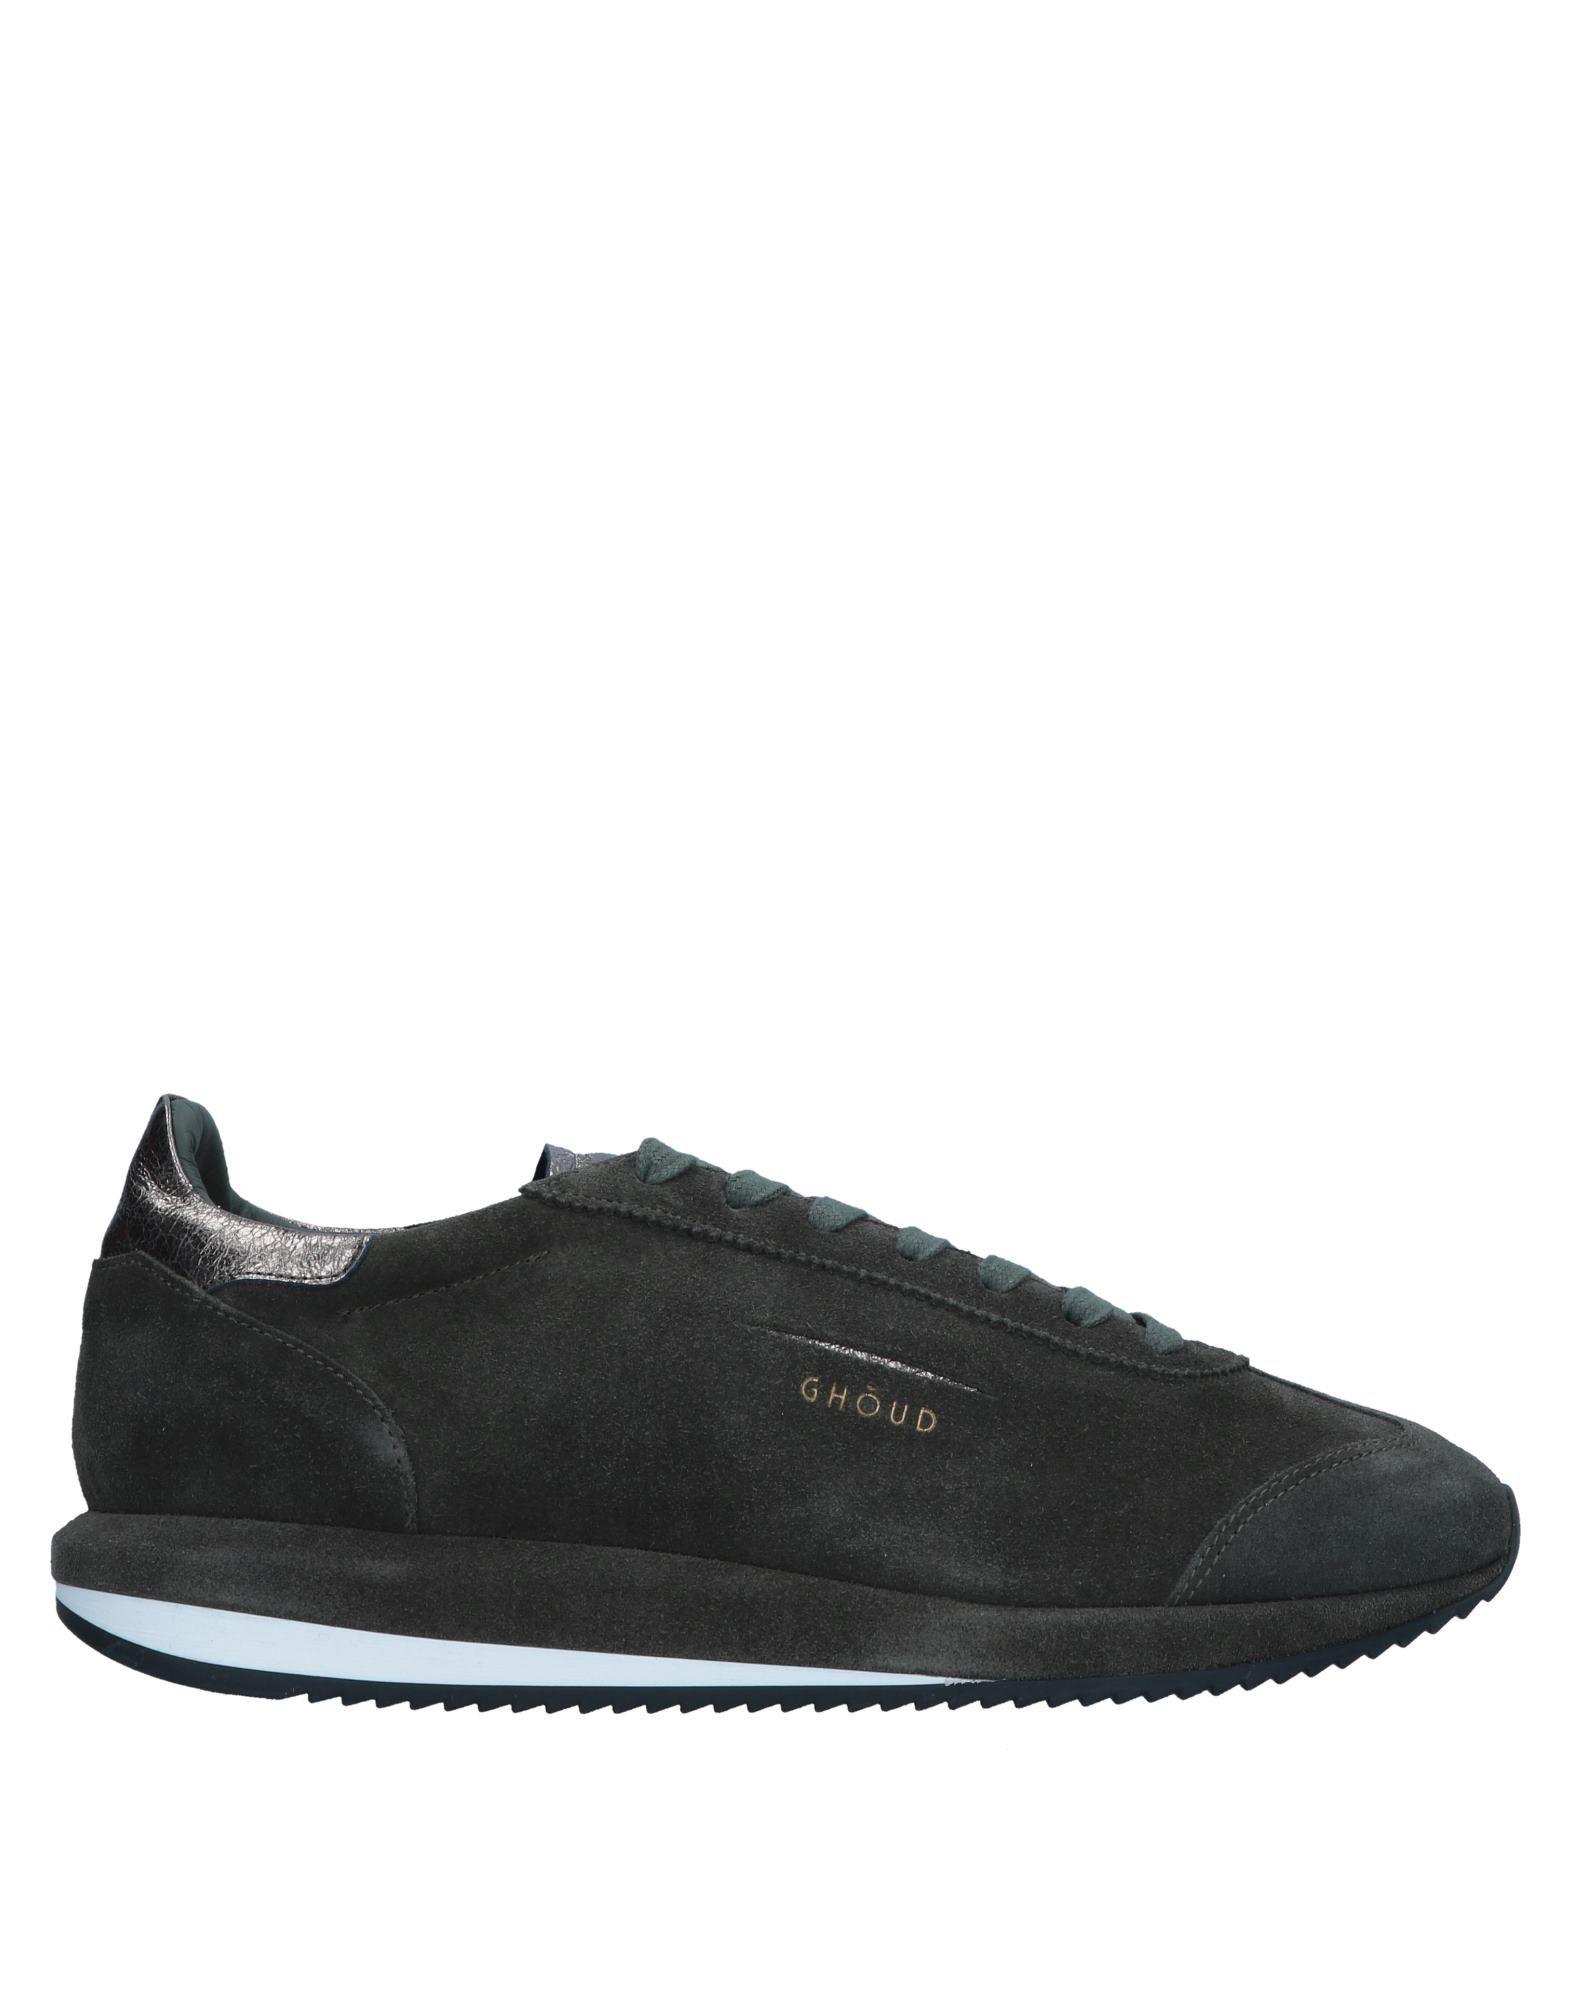 Ghōud Venice Sneakers Herren  11545389CO Gute Qualität beliebte Schuhe